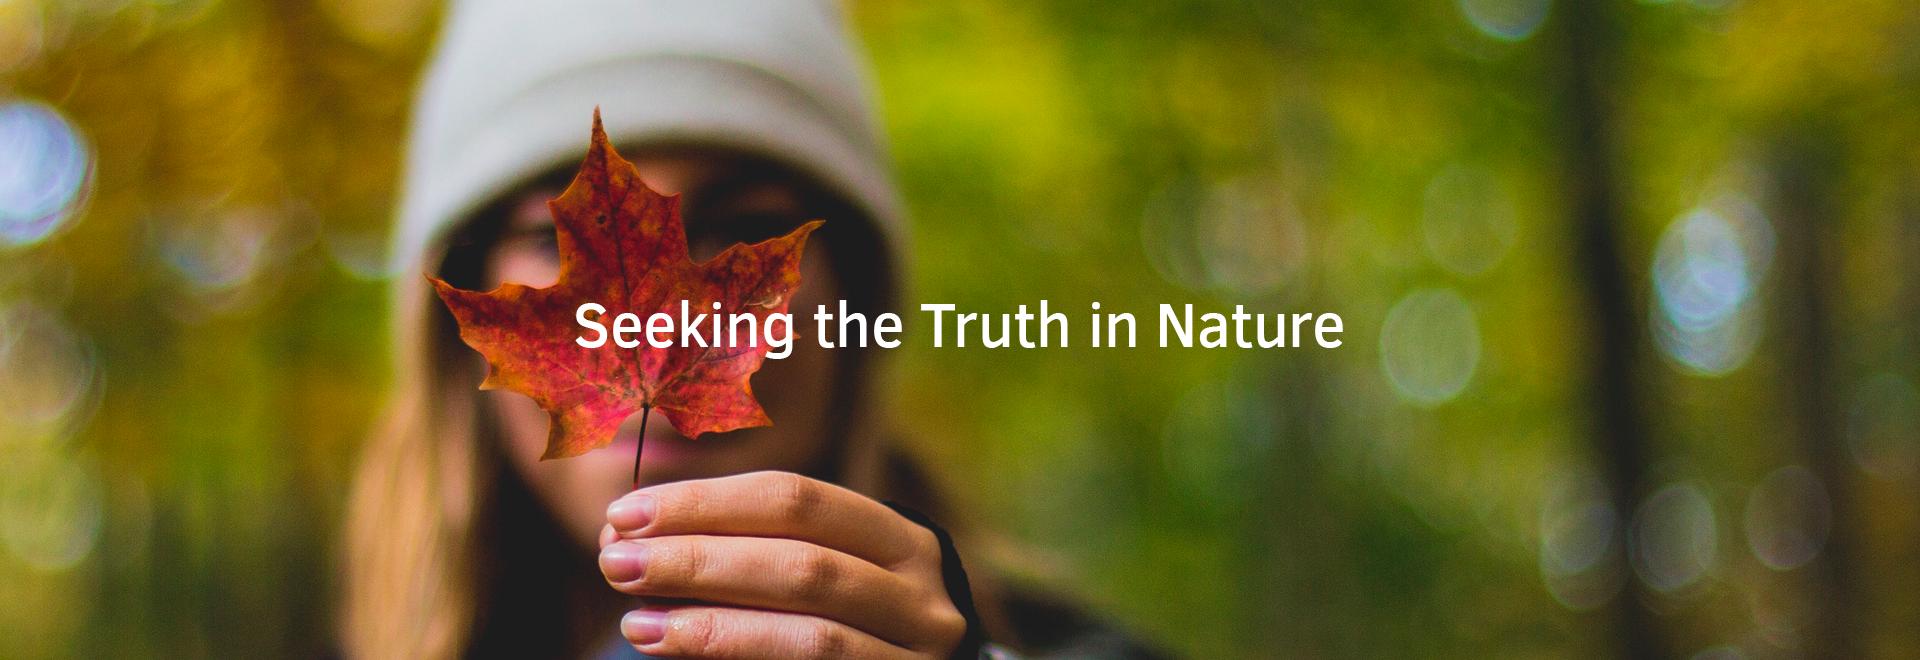 Seeking the Truth in Nature